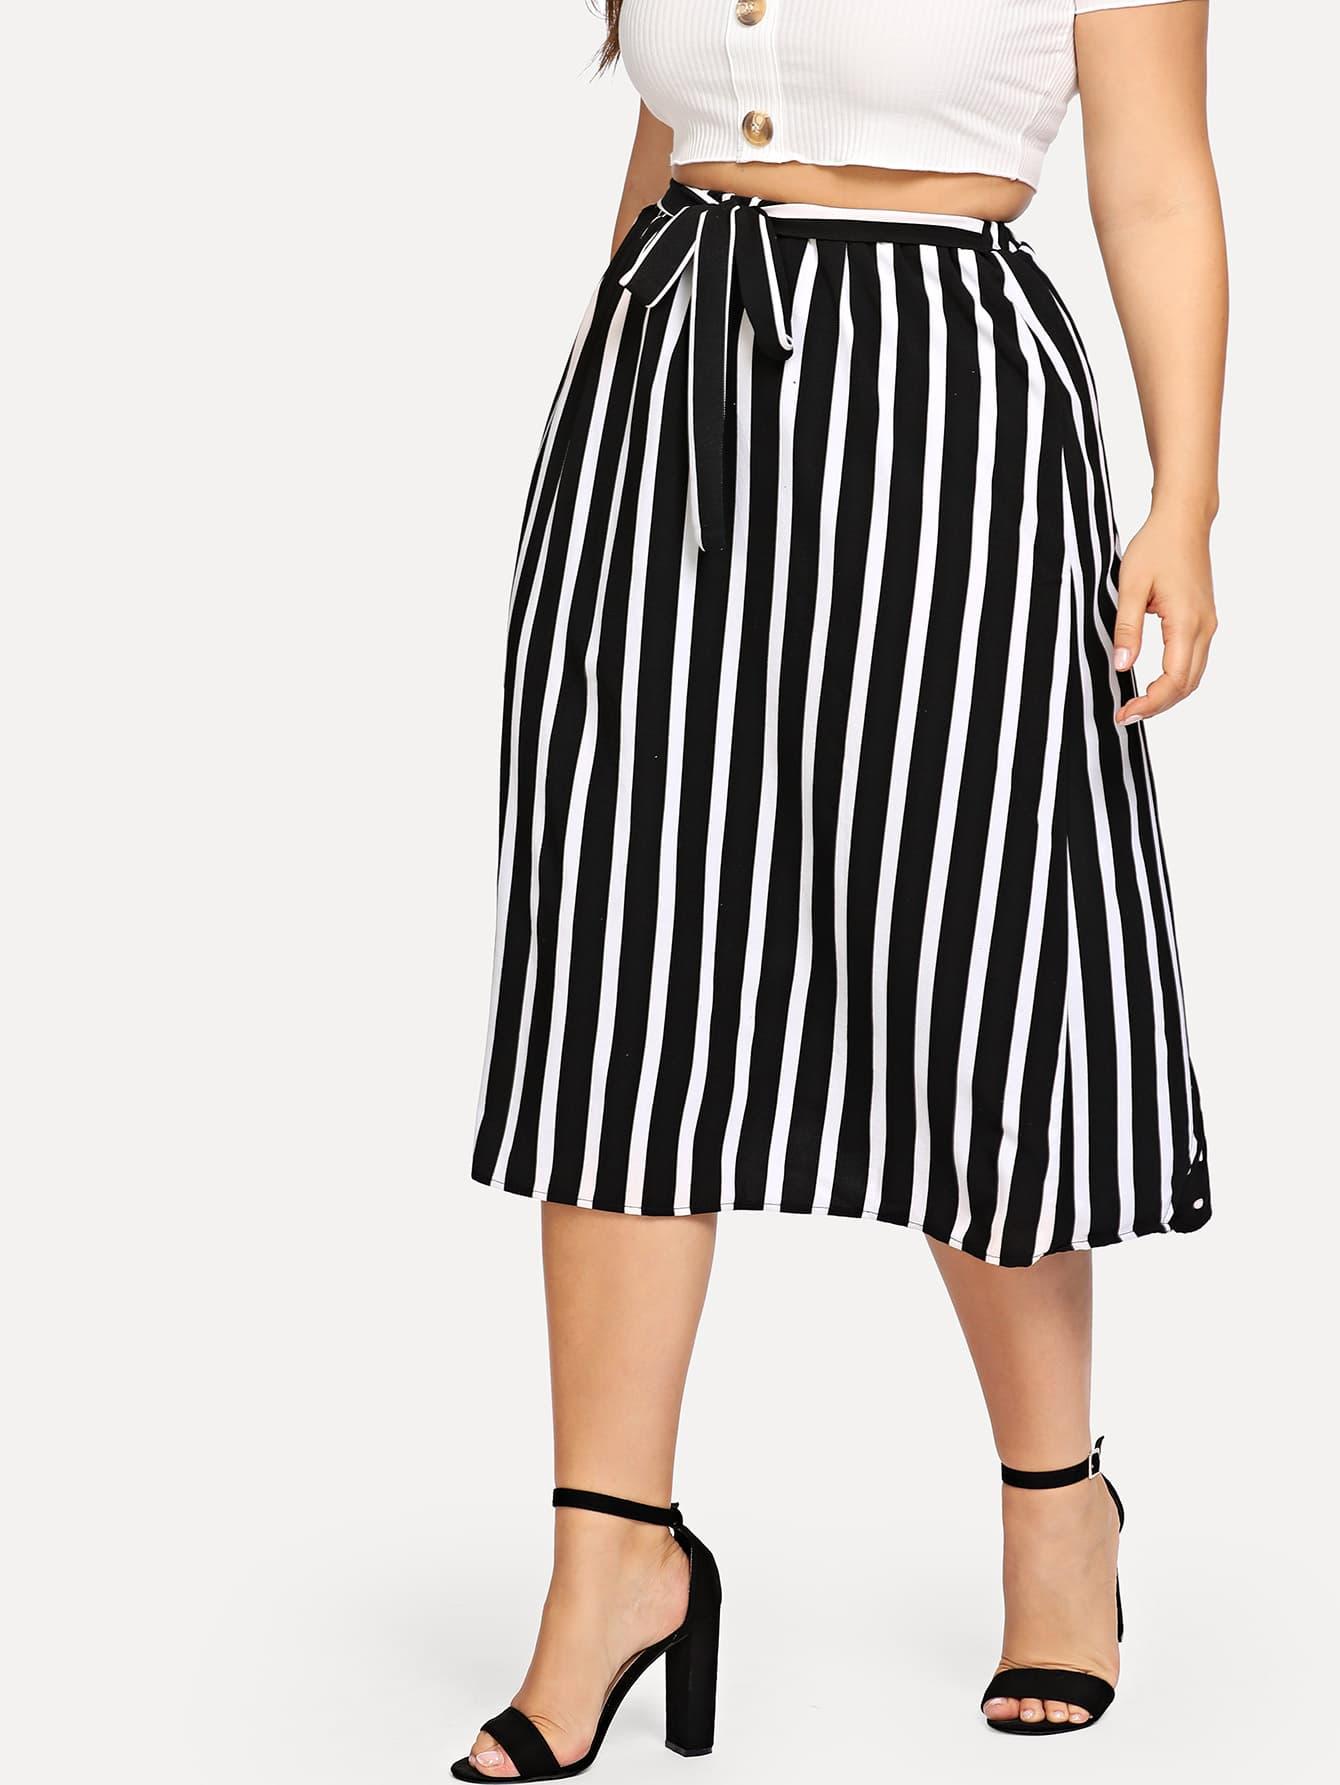 Plus Cut And Sew Mixed Print Skirt для vw golf vi passat b7 сс в логотип моторизованная интерфейс камеры vw passat cc intro camera vdc 200